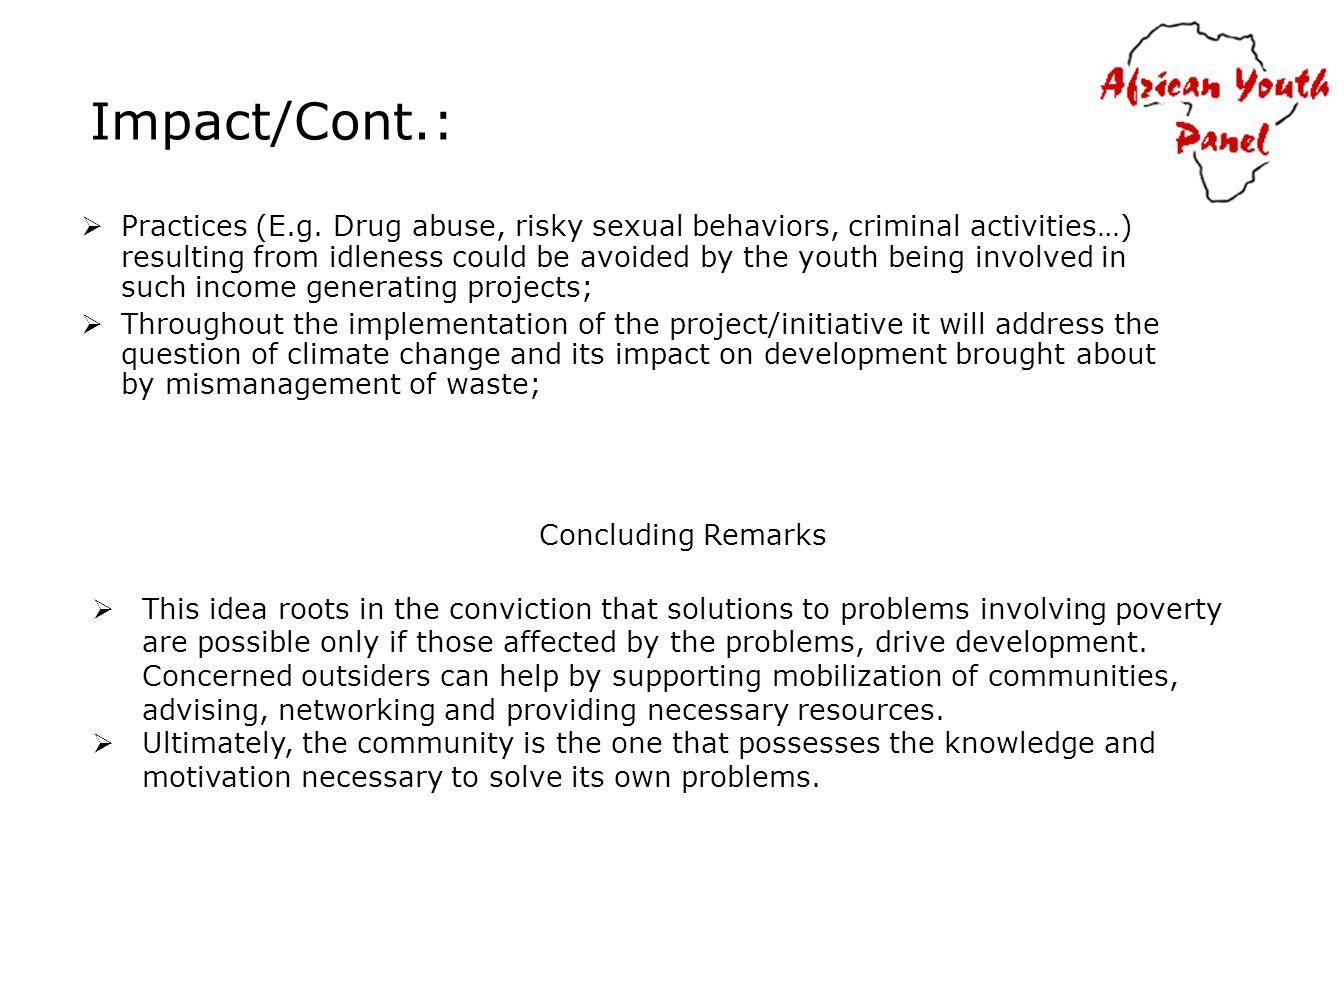 Impact/Cont.: